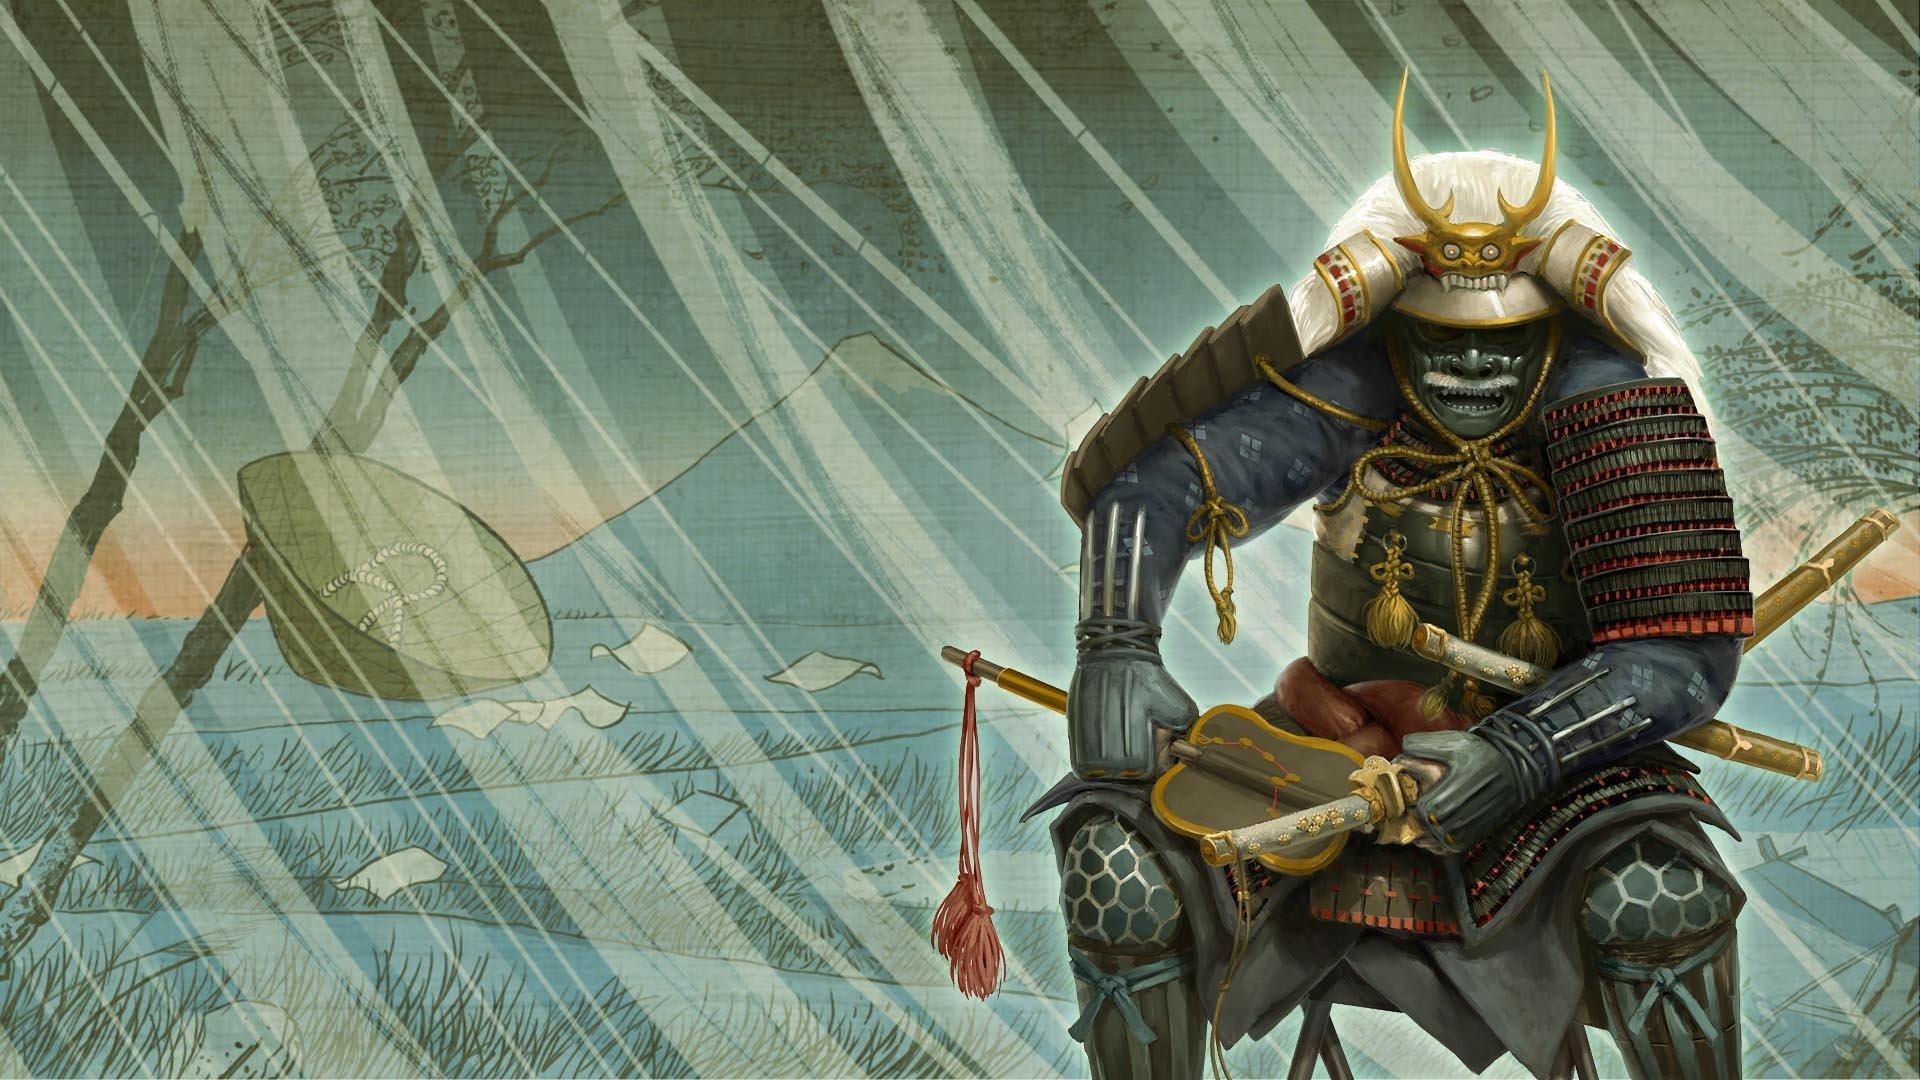 Shogun 2 Fall Of The Samurai Wallpaper Shogun Fond D 233 Cran Hd Arri 232 Re Plan 1920x1080 Id